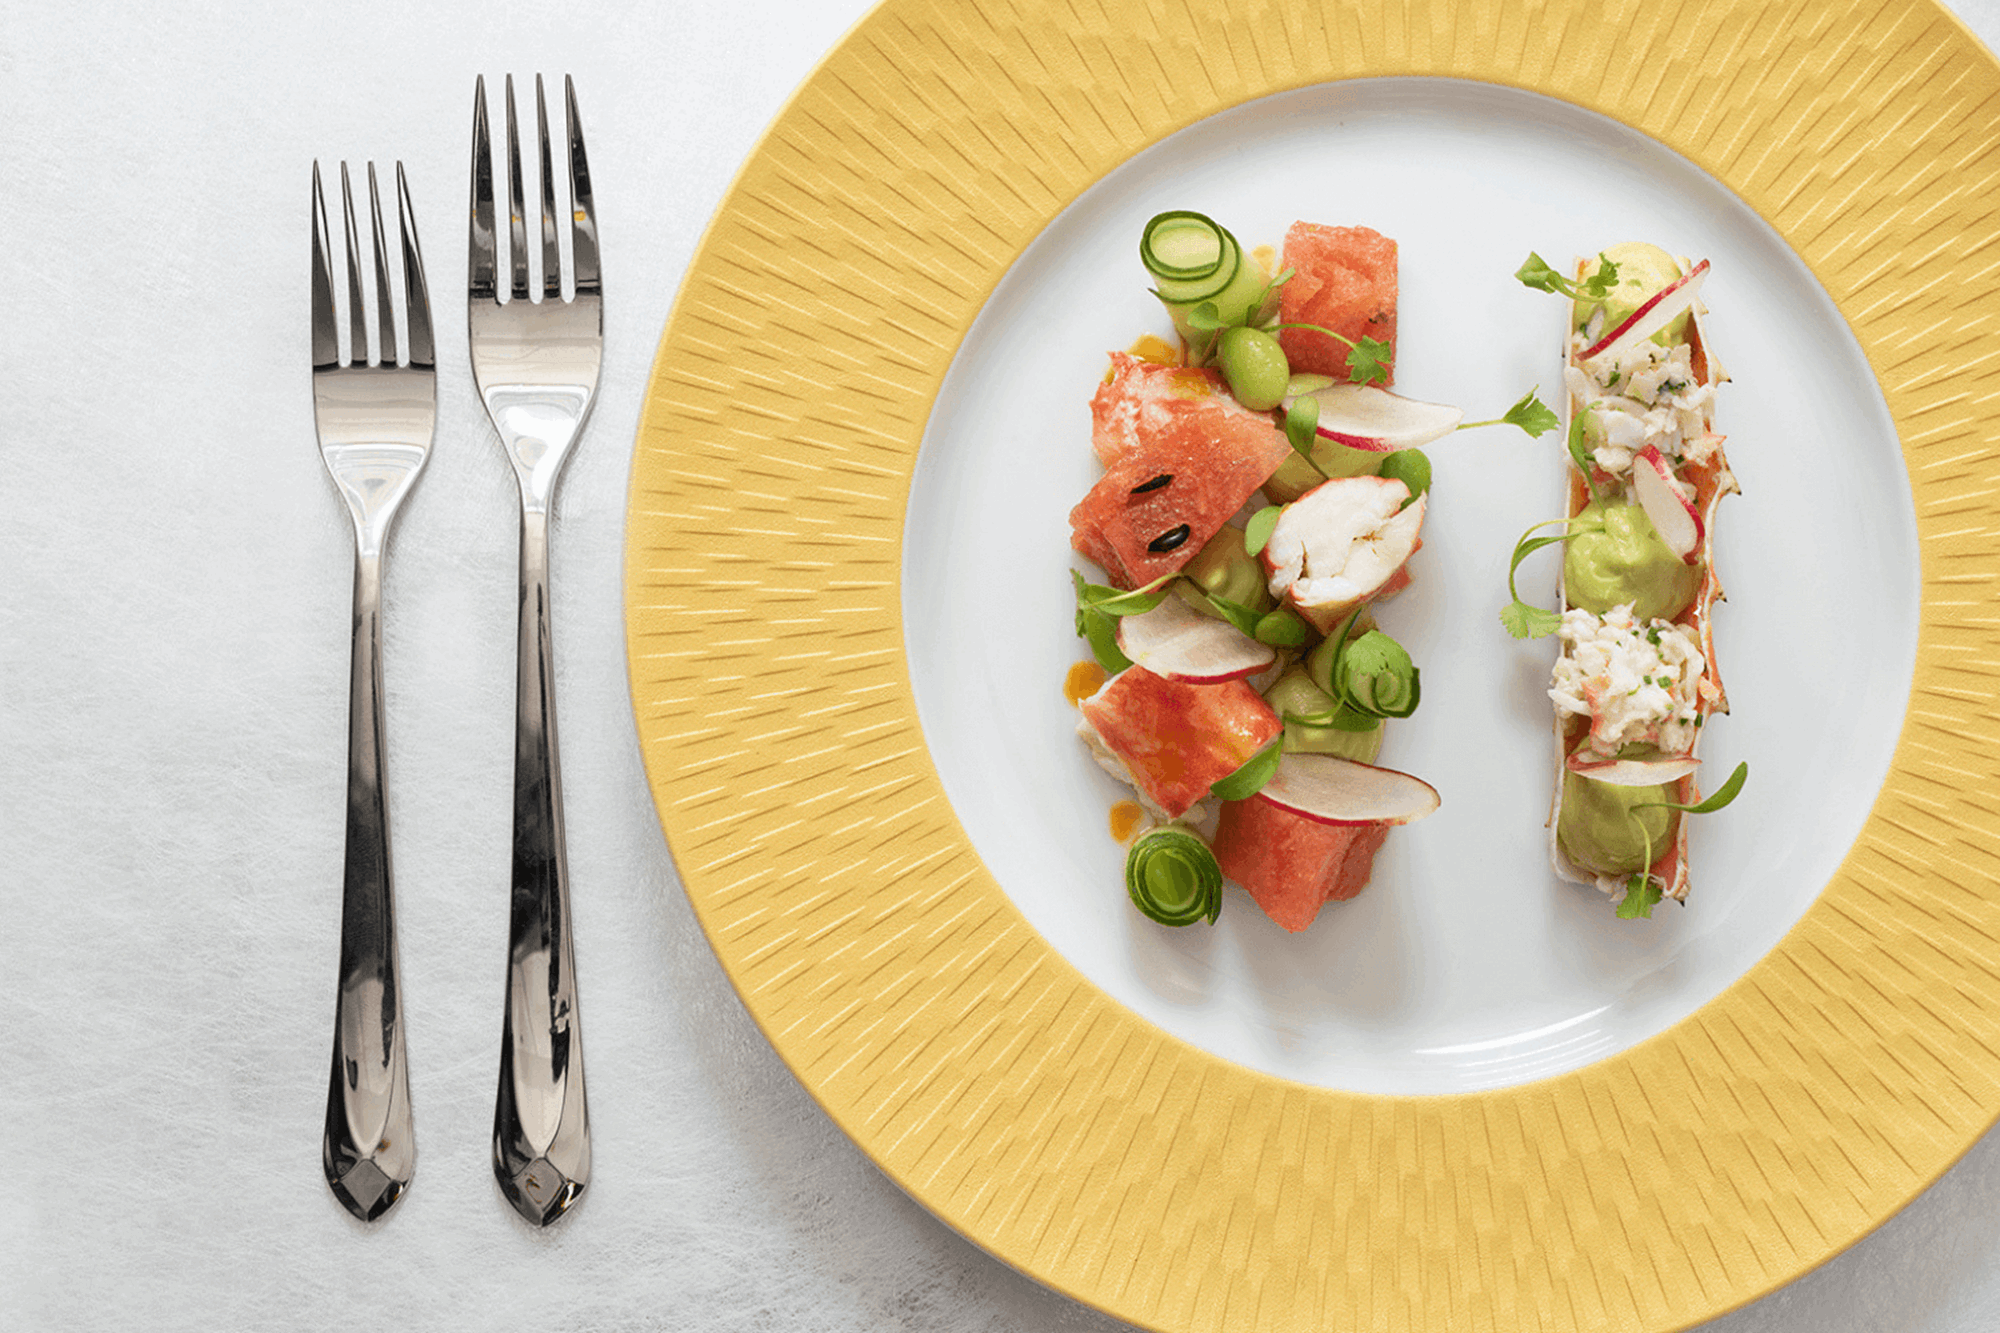 Best new London restaurants: Selfridges London department store has a new luxury restaurant called Brasserie of Light